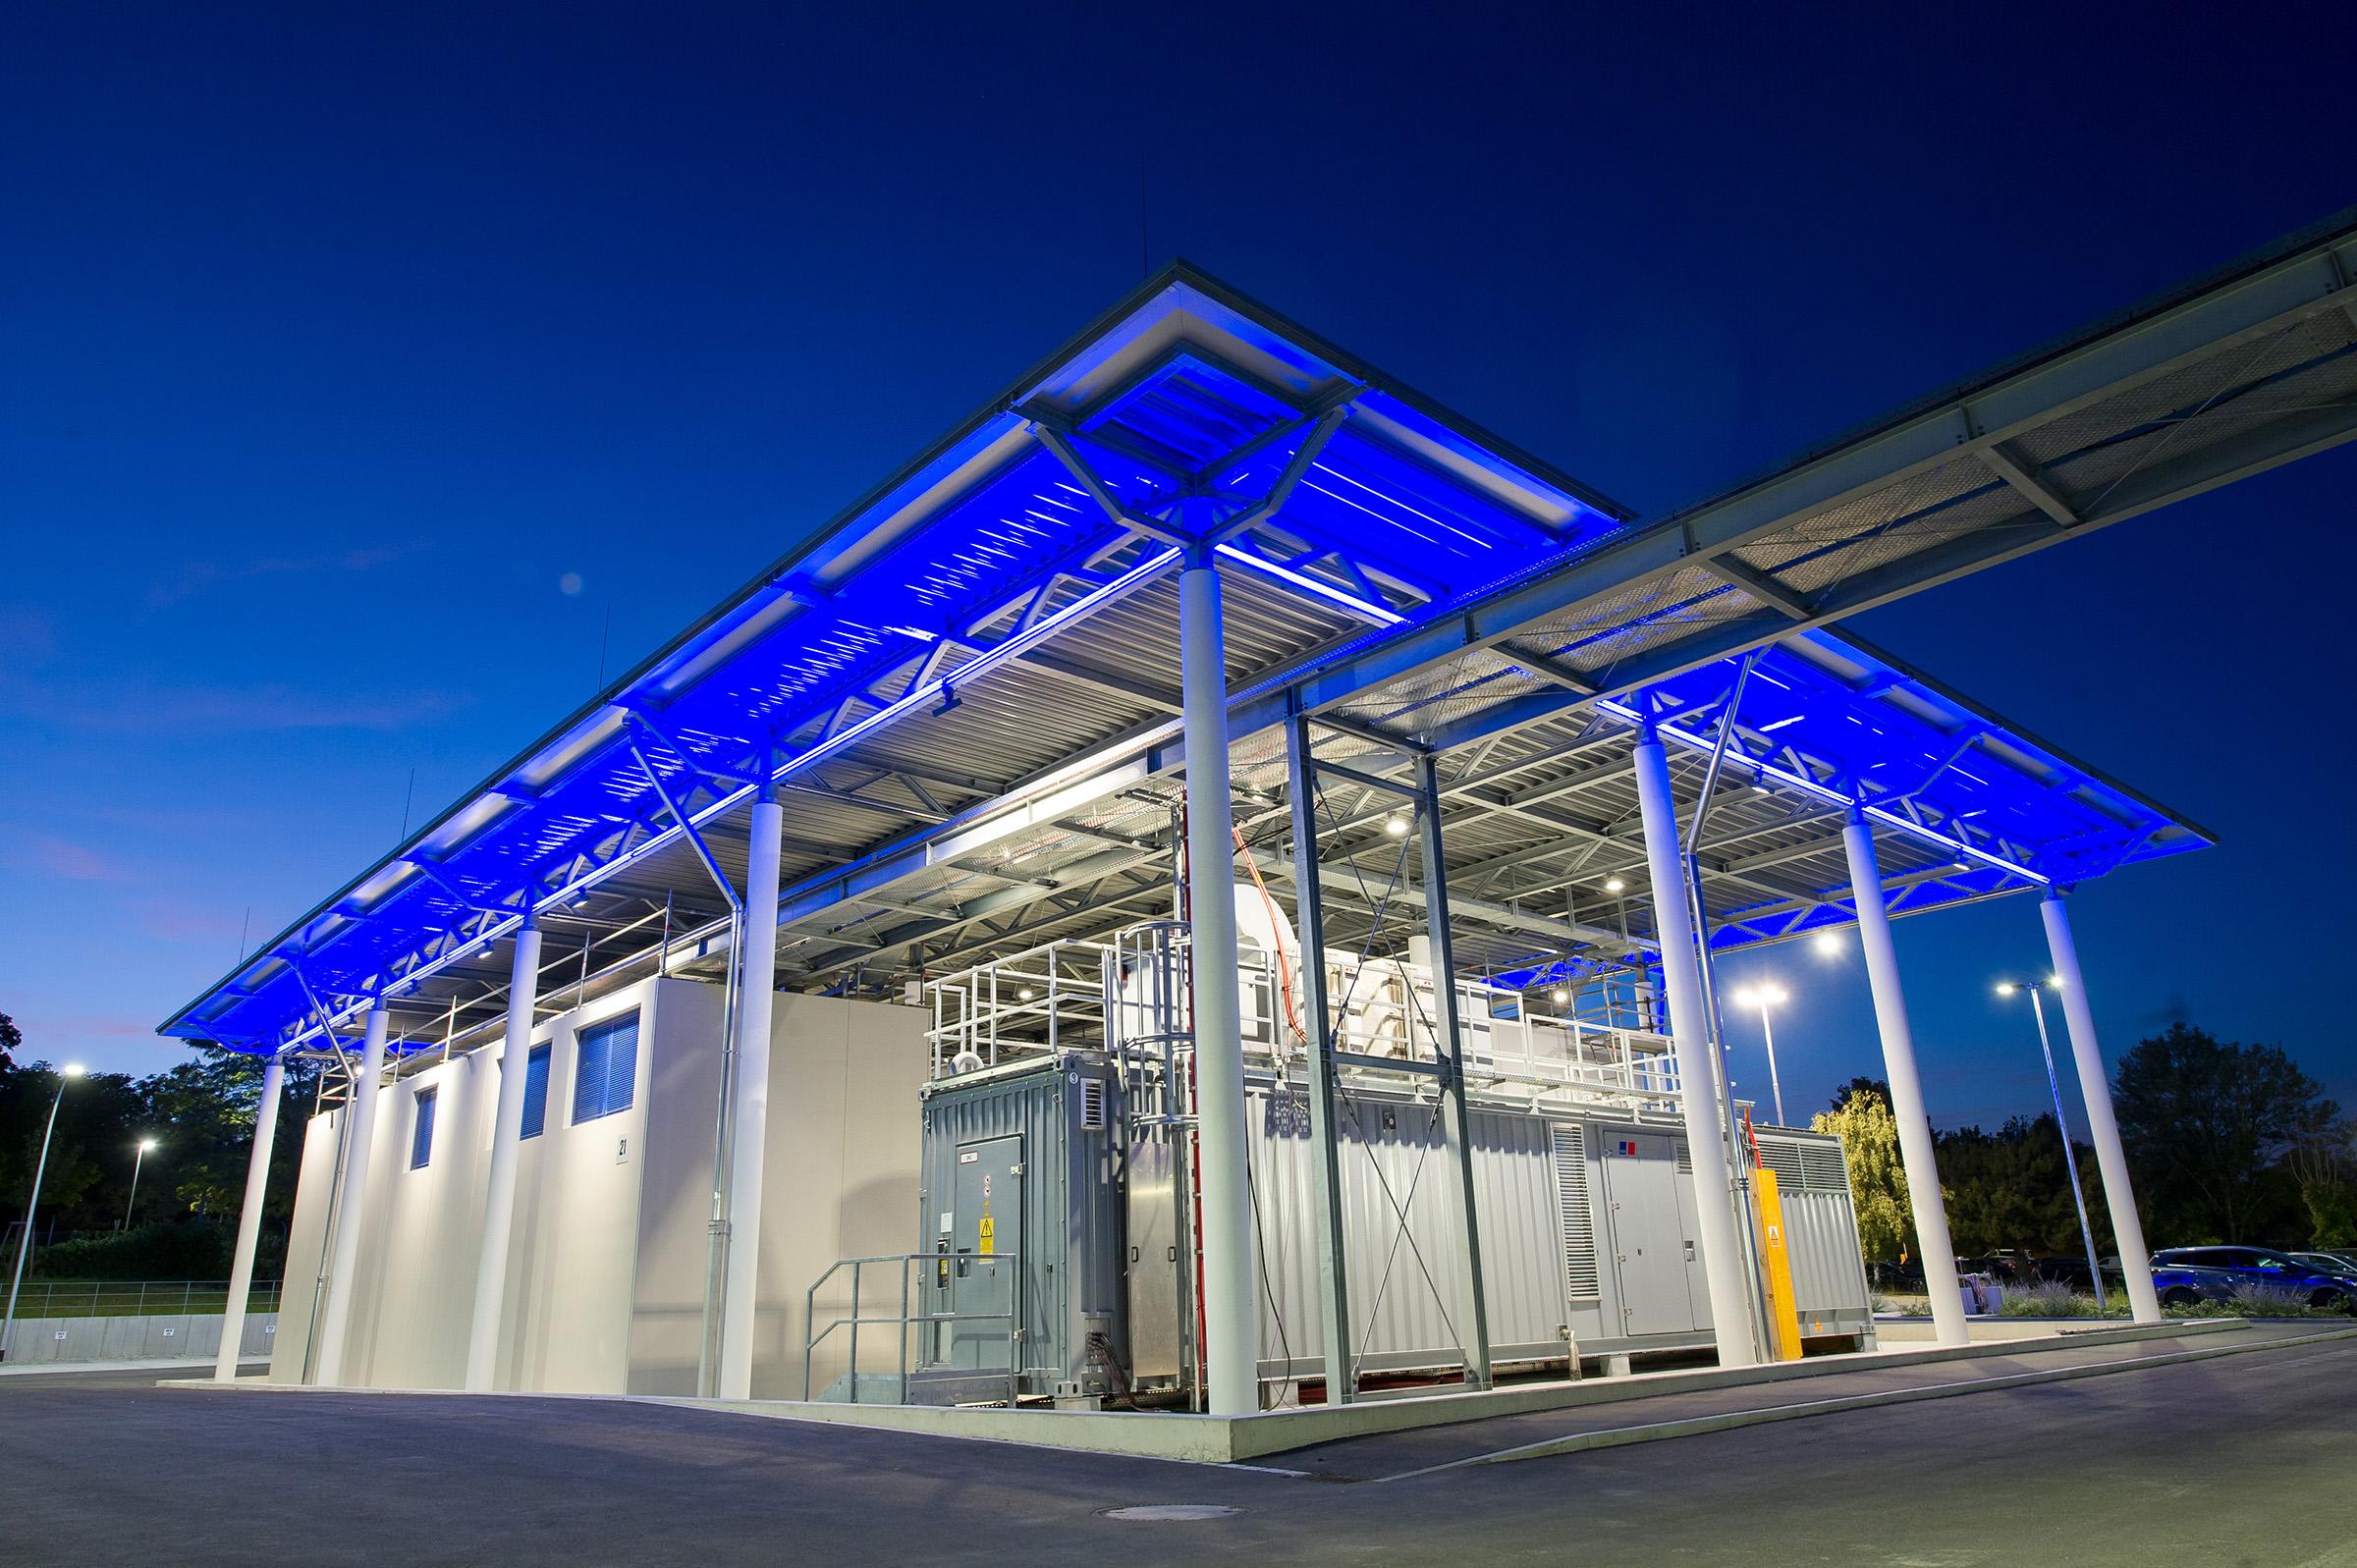 Rolls-Royce MTU Microgrid Validation Center